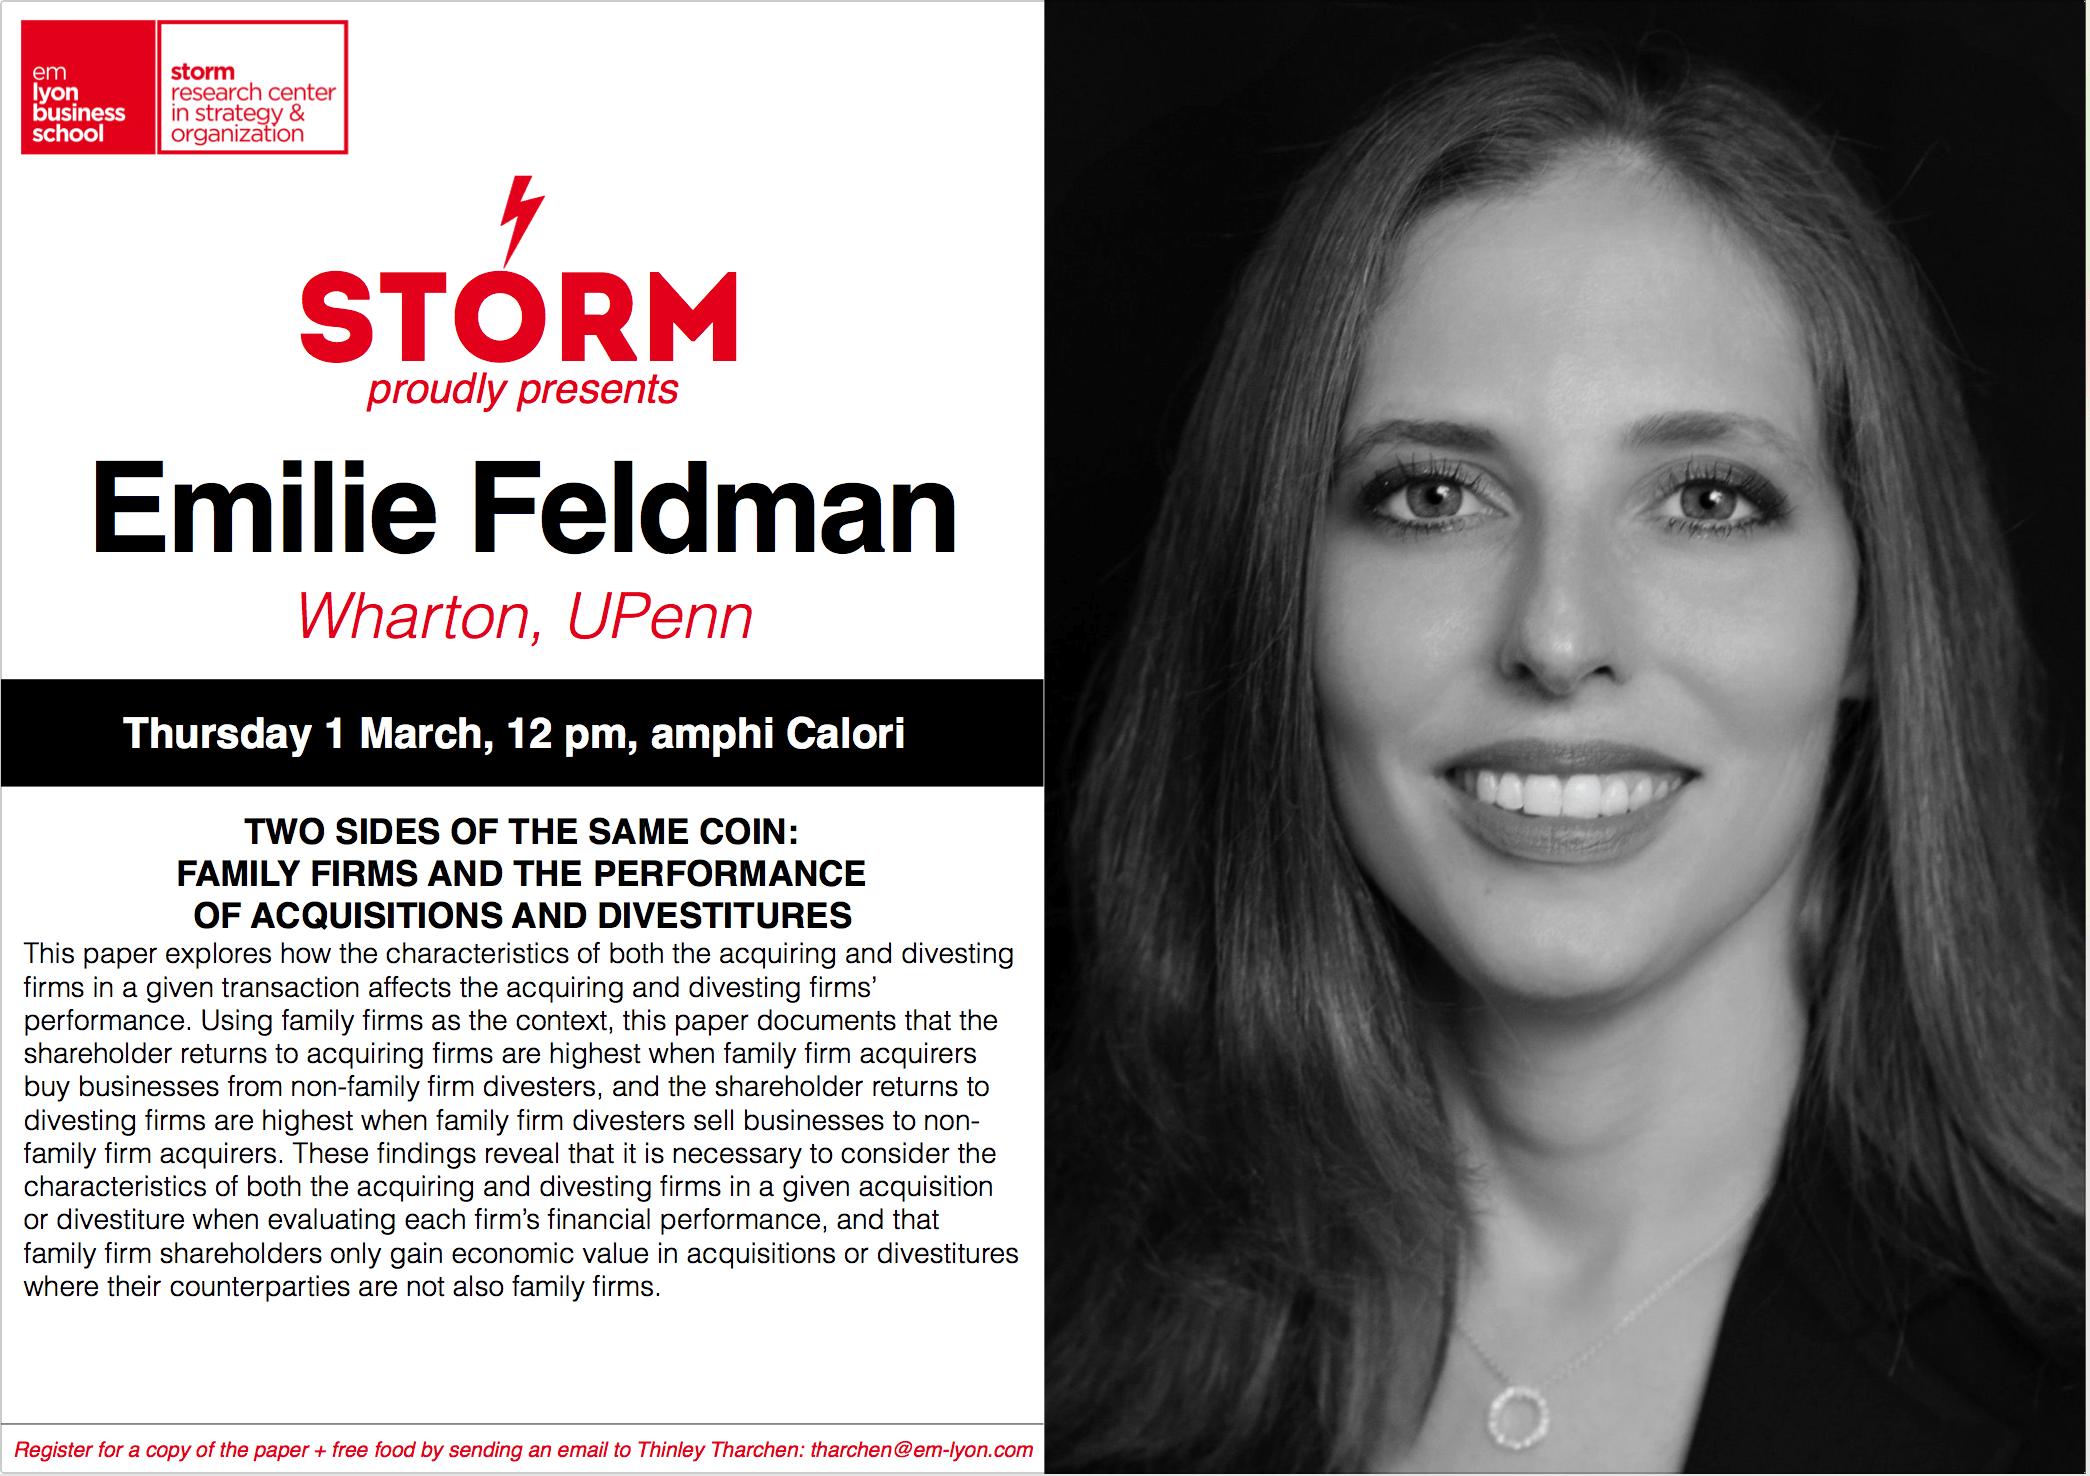 01 March 2018: EMILIE FELDMAN (Wharton, U. Penn)